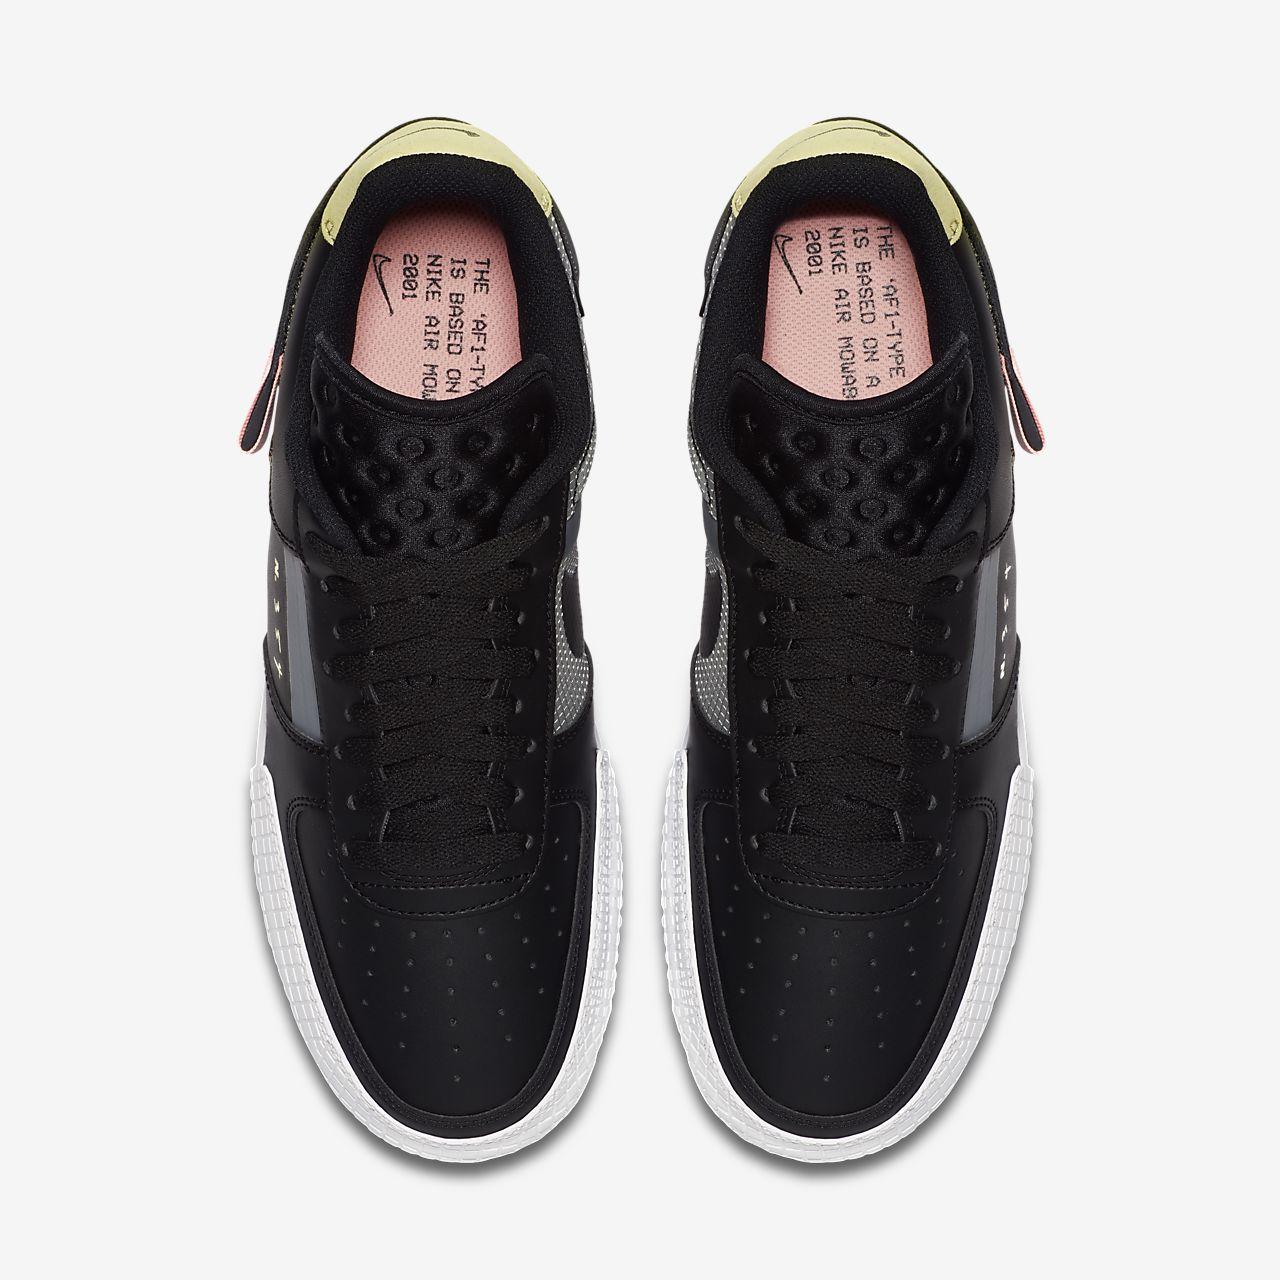 Calzado para hombre Nike Air Force 1 Type